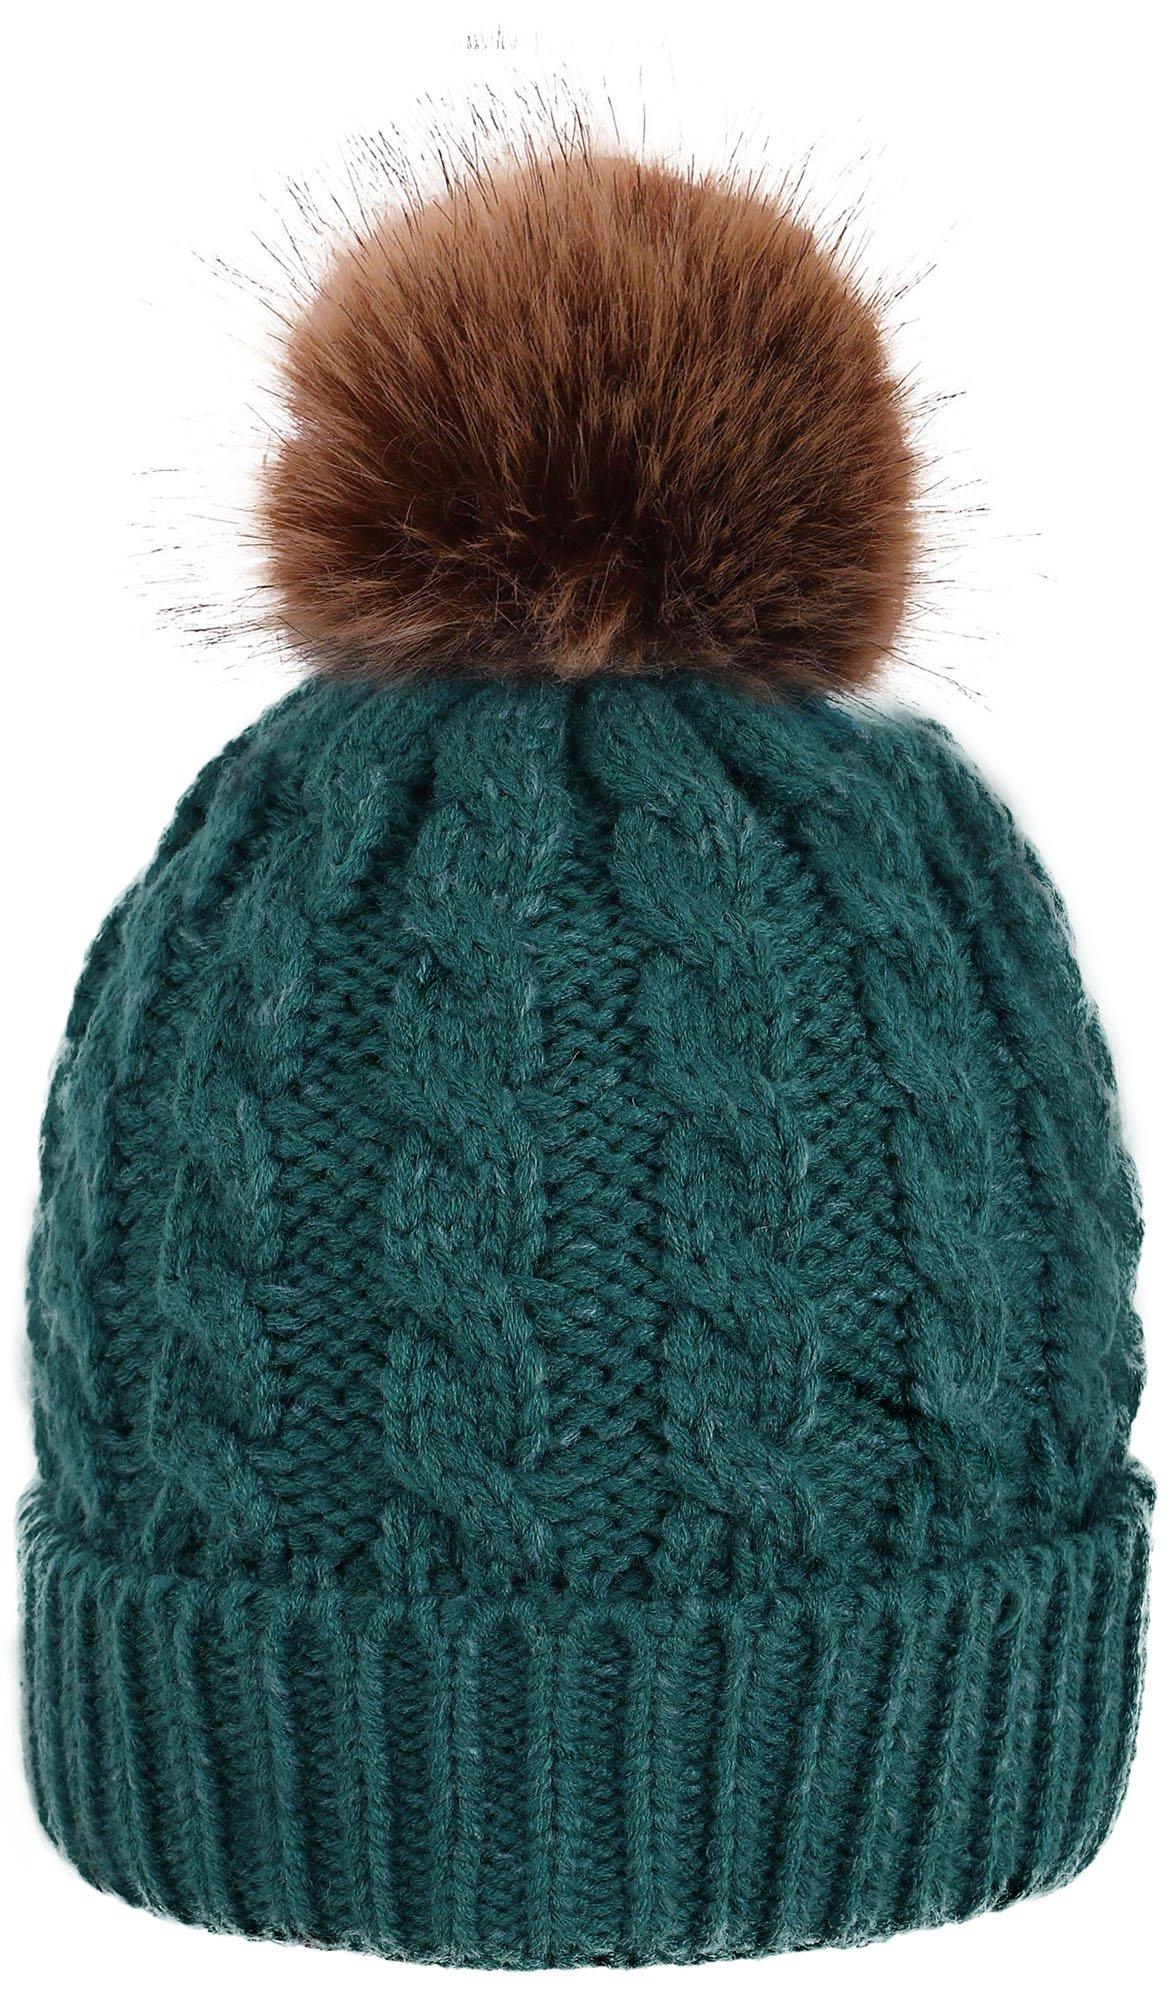 Simplicity Men/Women's Winter Hand Knit Faux Fur Pompoms Beanie Hat, Green